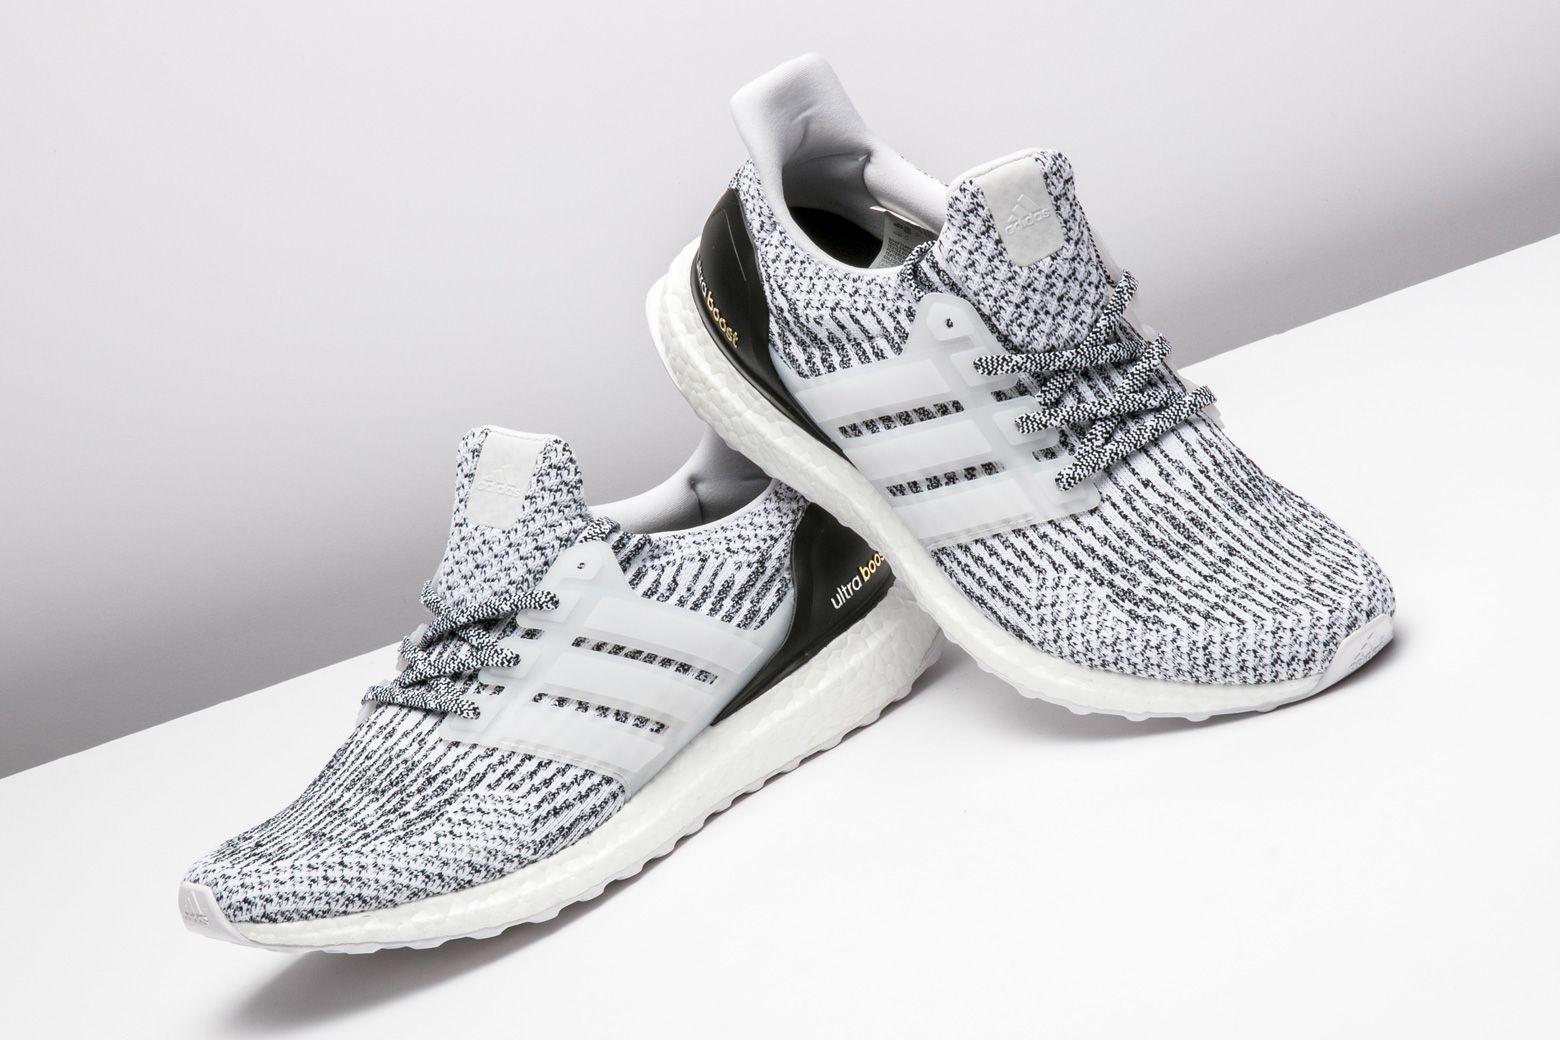 adidas Ultraboost Mens Sneaker   Modell's Sporting Goods